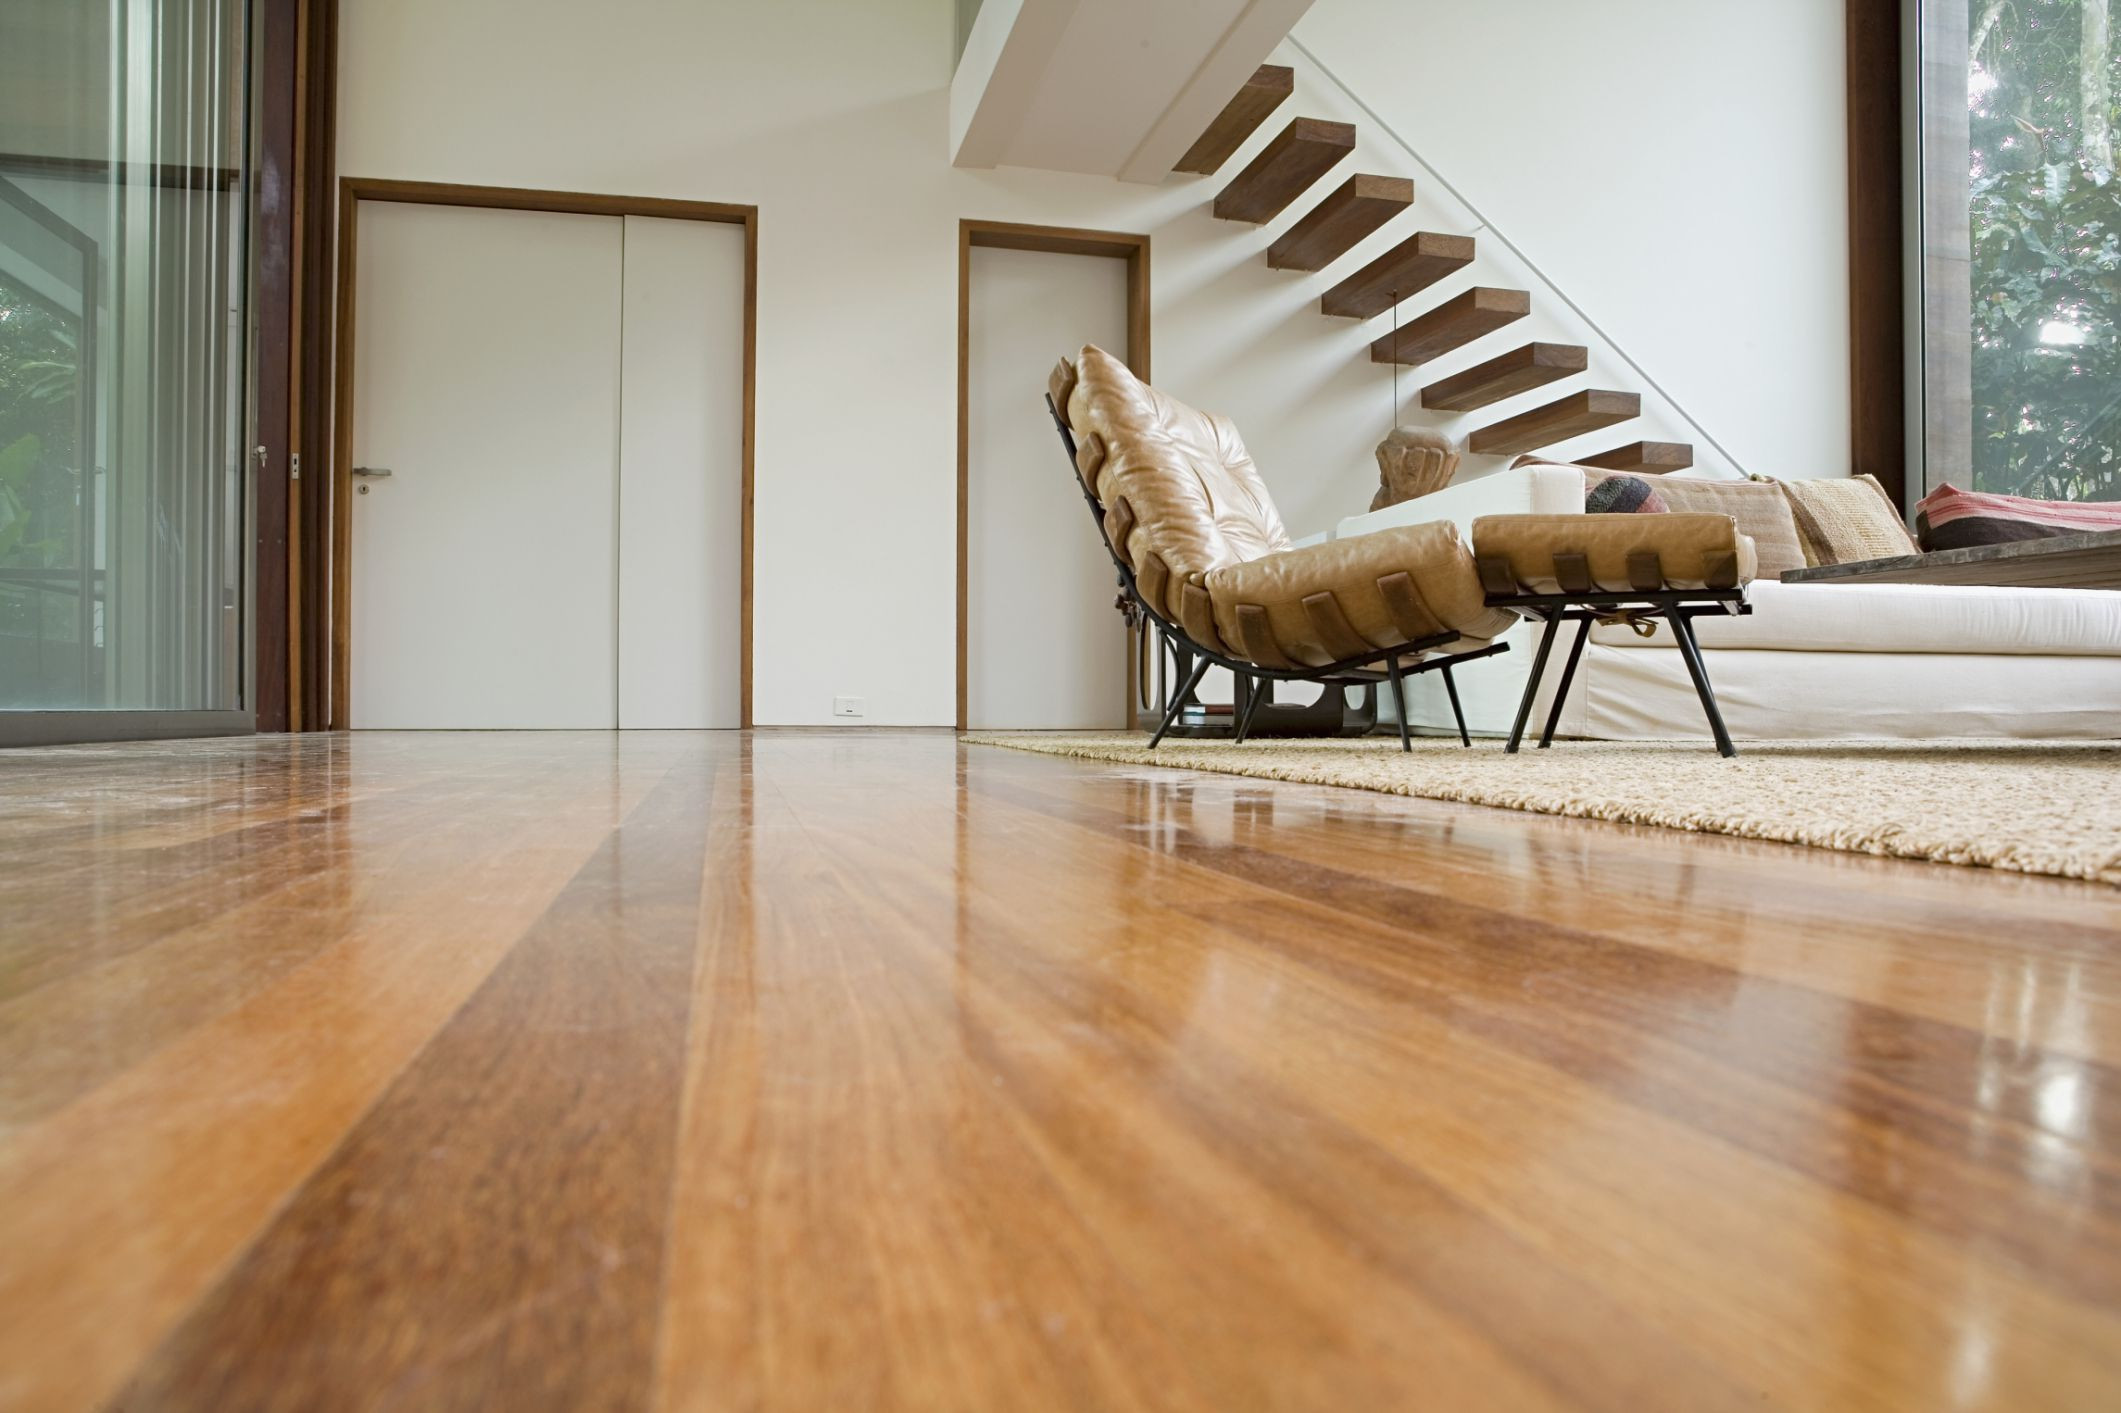 DIY Sanding Hardwood Floors  11 Unique Sanding Hardwood Floors Diy